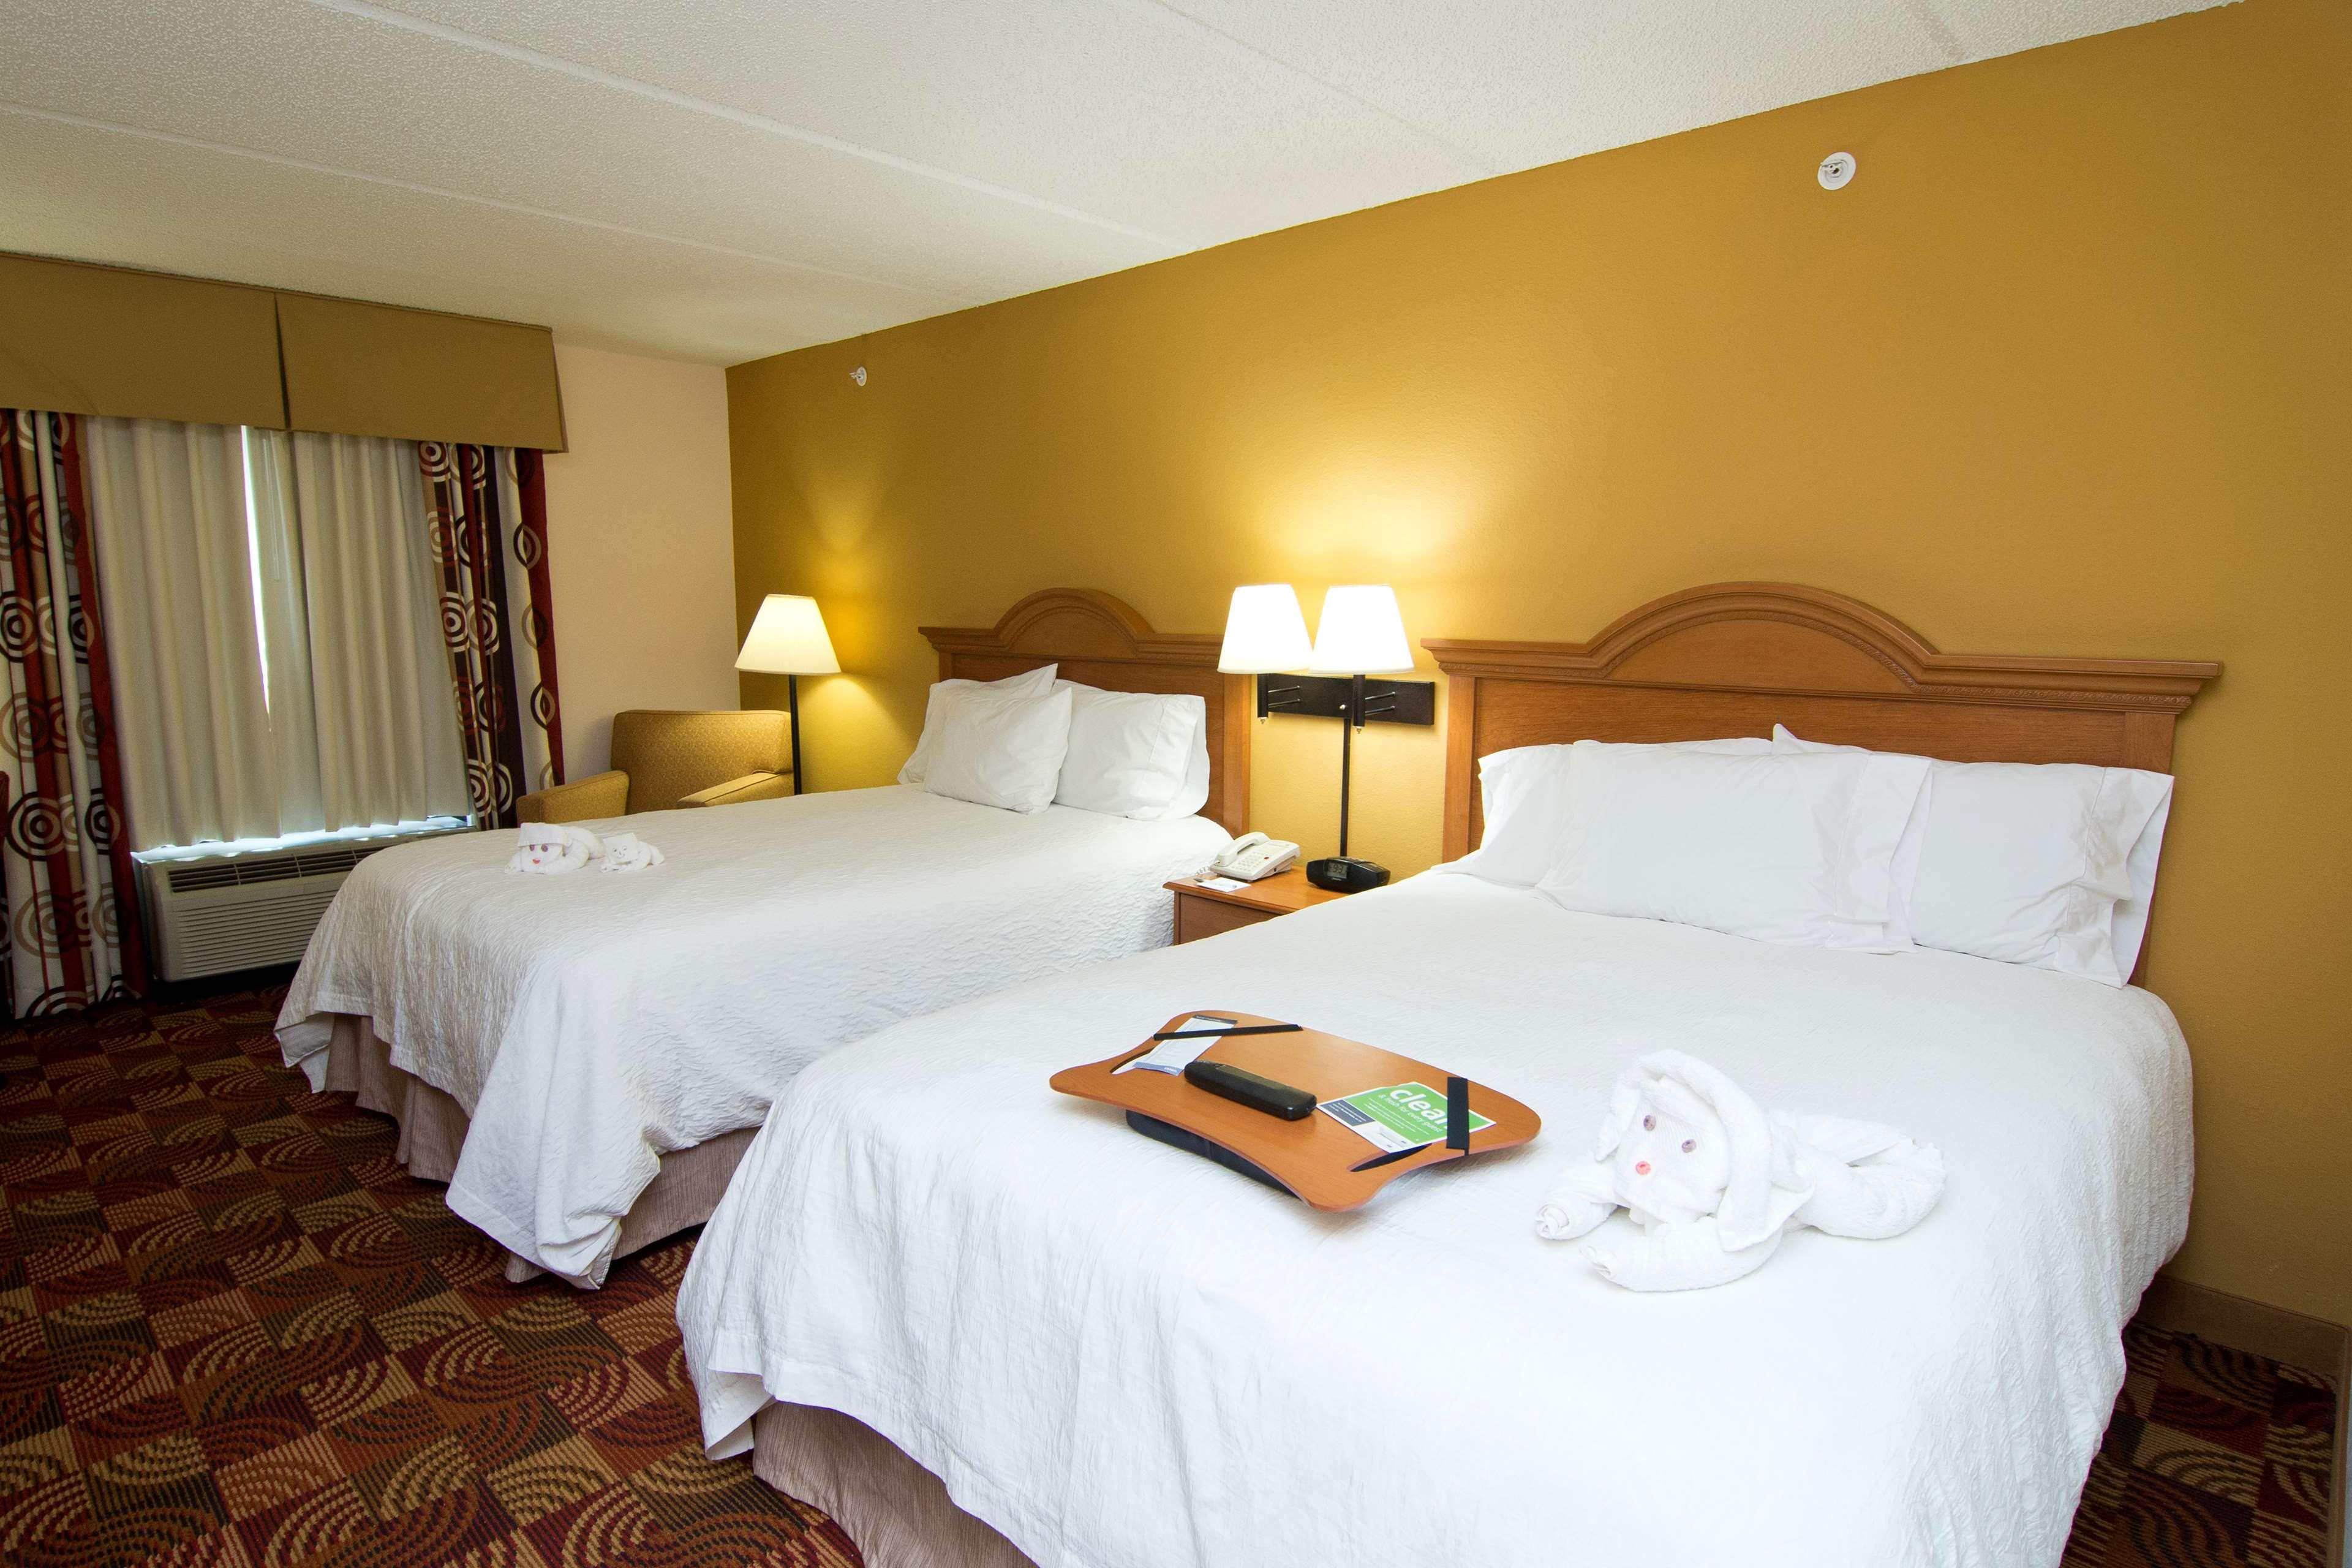 Hampton Inn & Suites Orlando Intl Dr N image 11